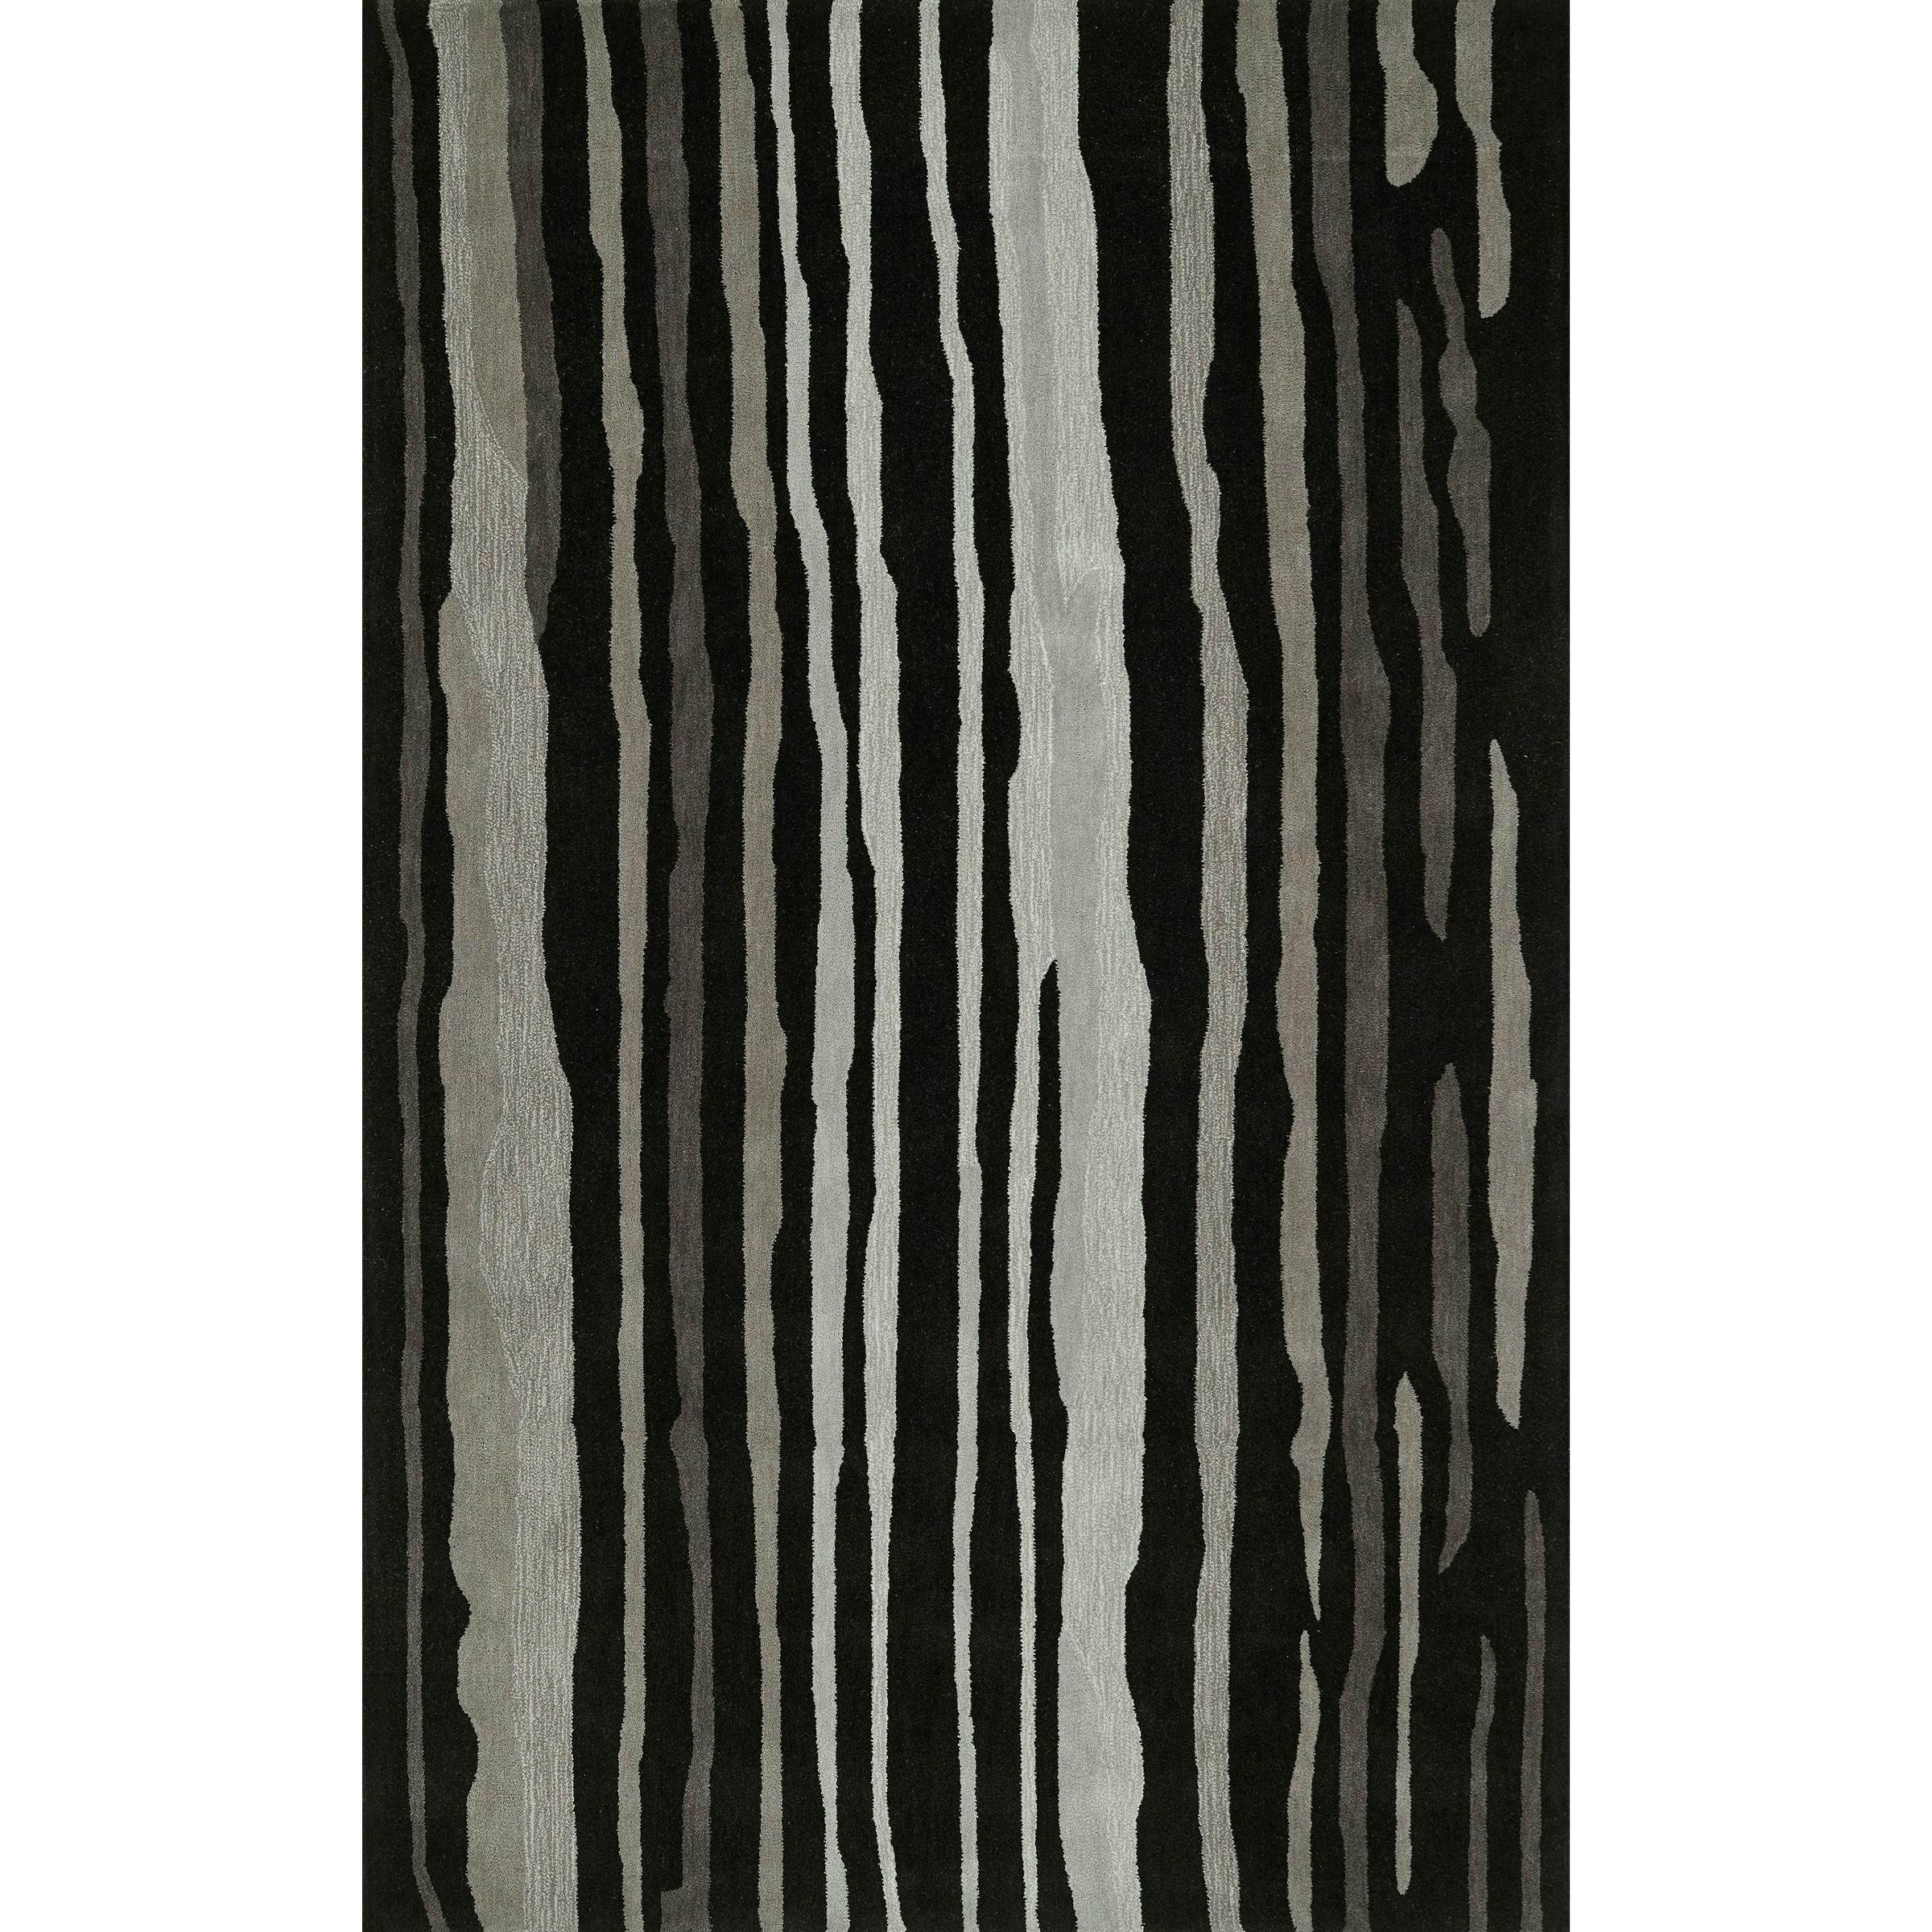 "Journey Black 5' x 7'6"" Rug by Dalyn at Sadler's Home Furnishings"